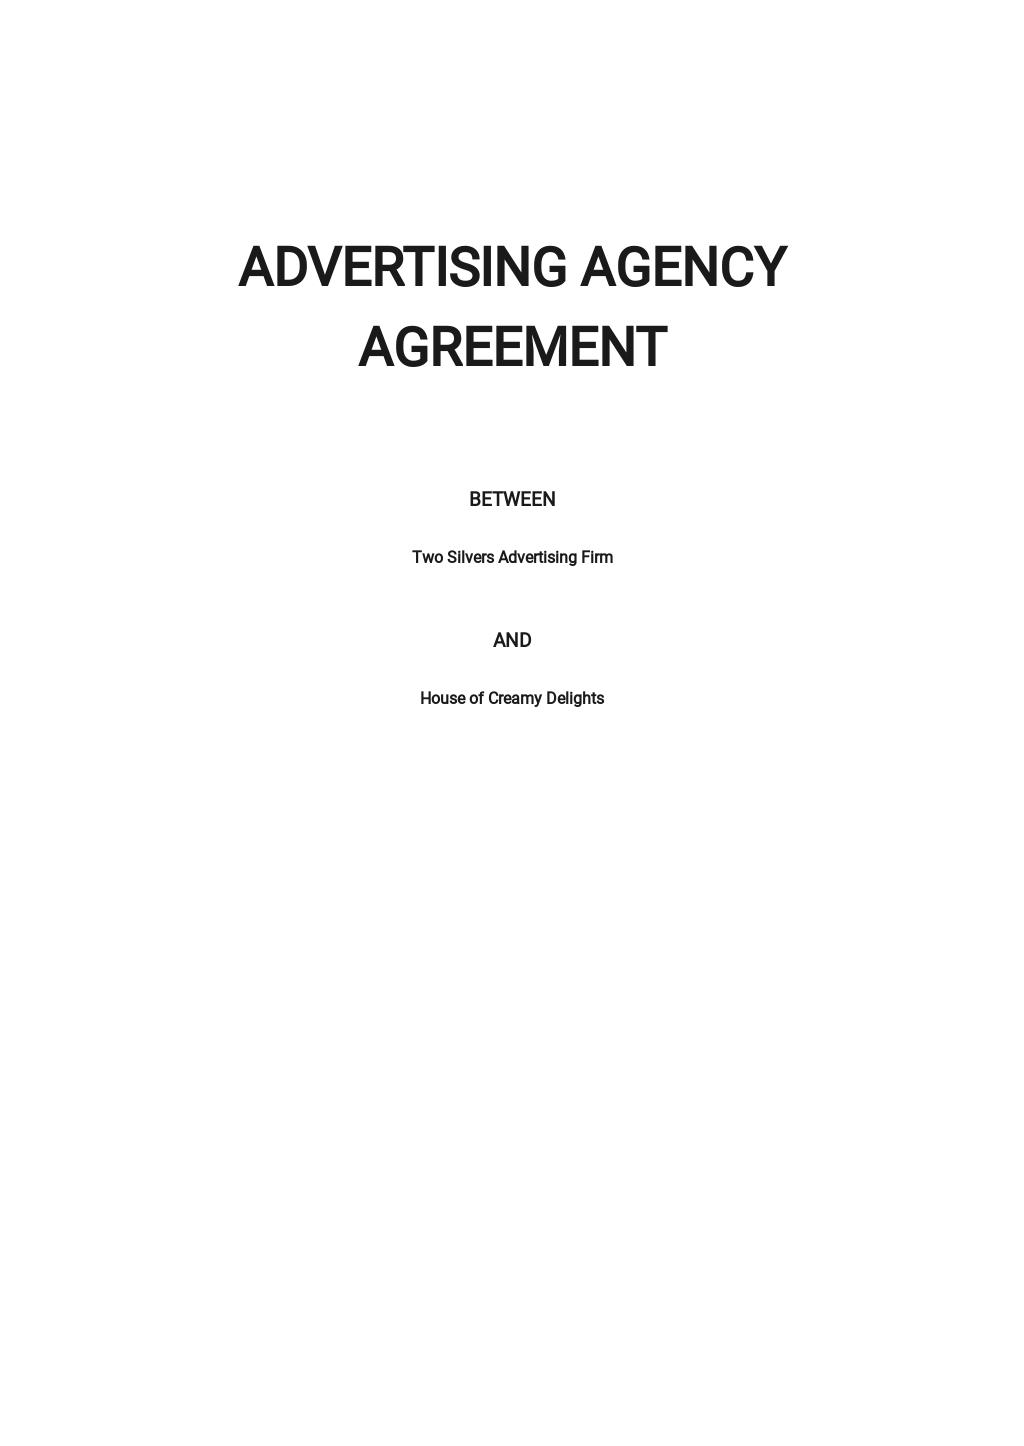 Sample Advertising Agency Agreement Template